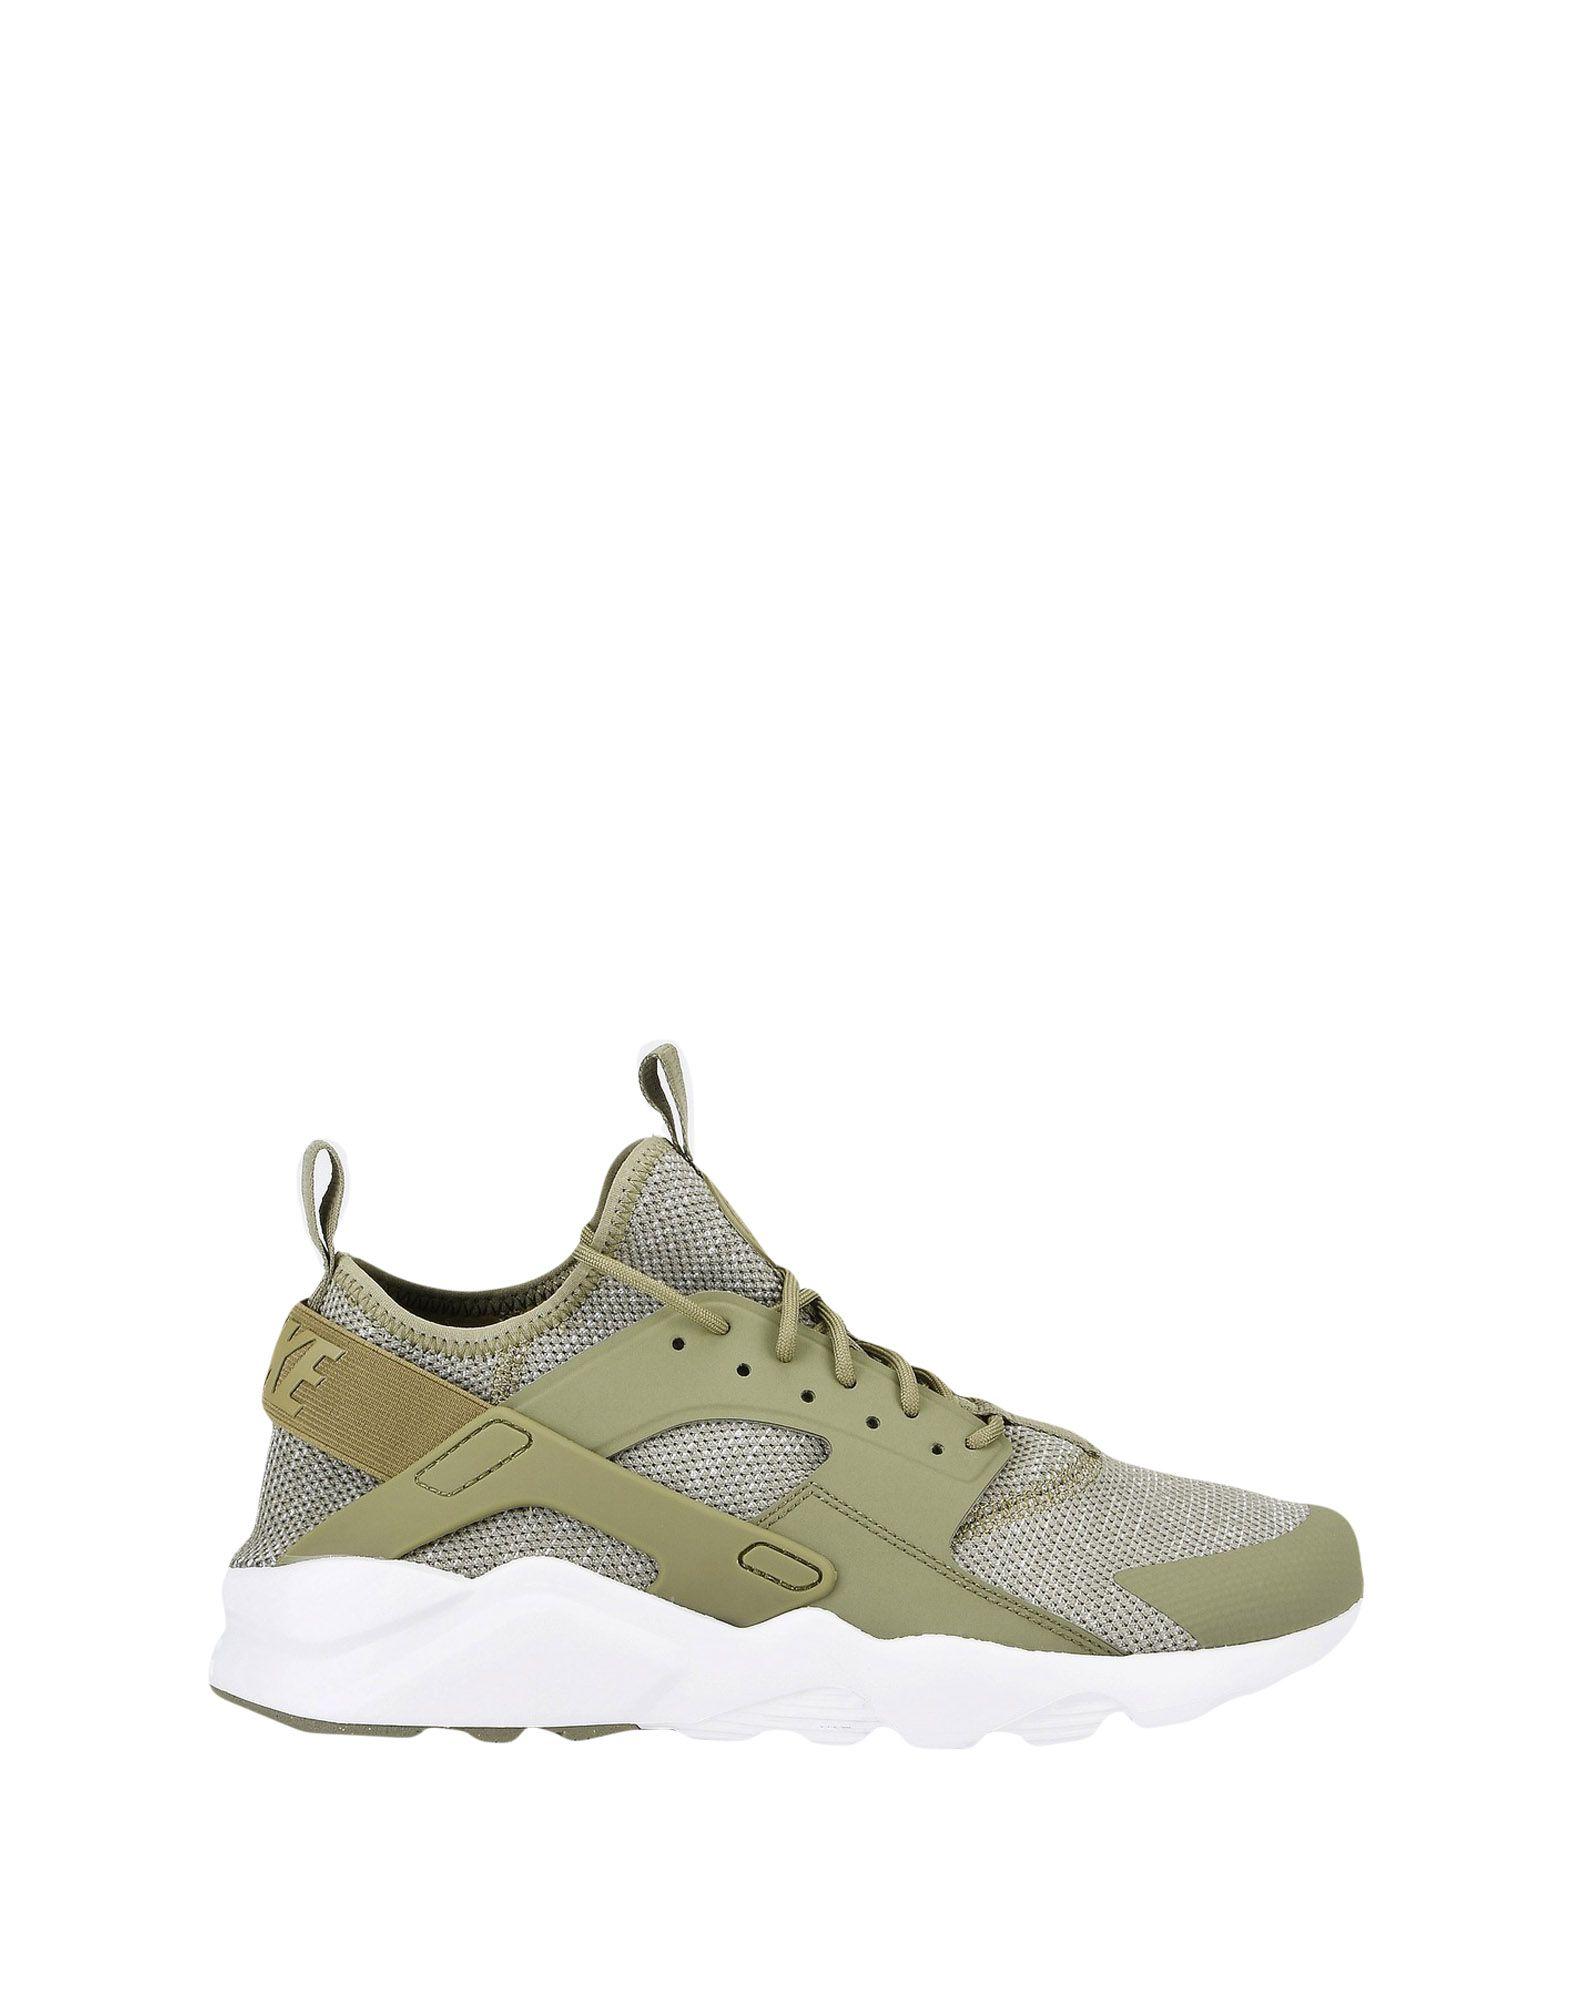 Sneakers Nike  Air Huarache Run Ultra Breathe - Homme - Sneakers Nike sur